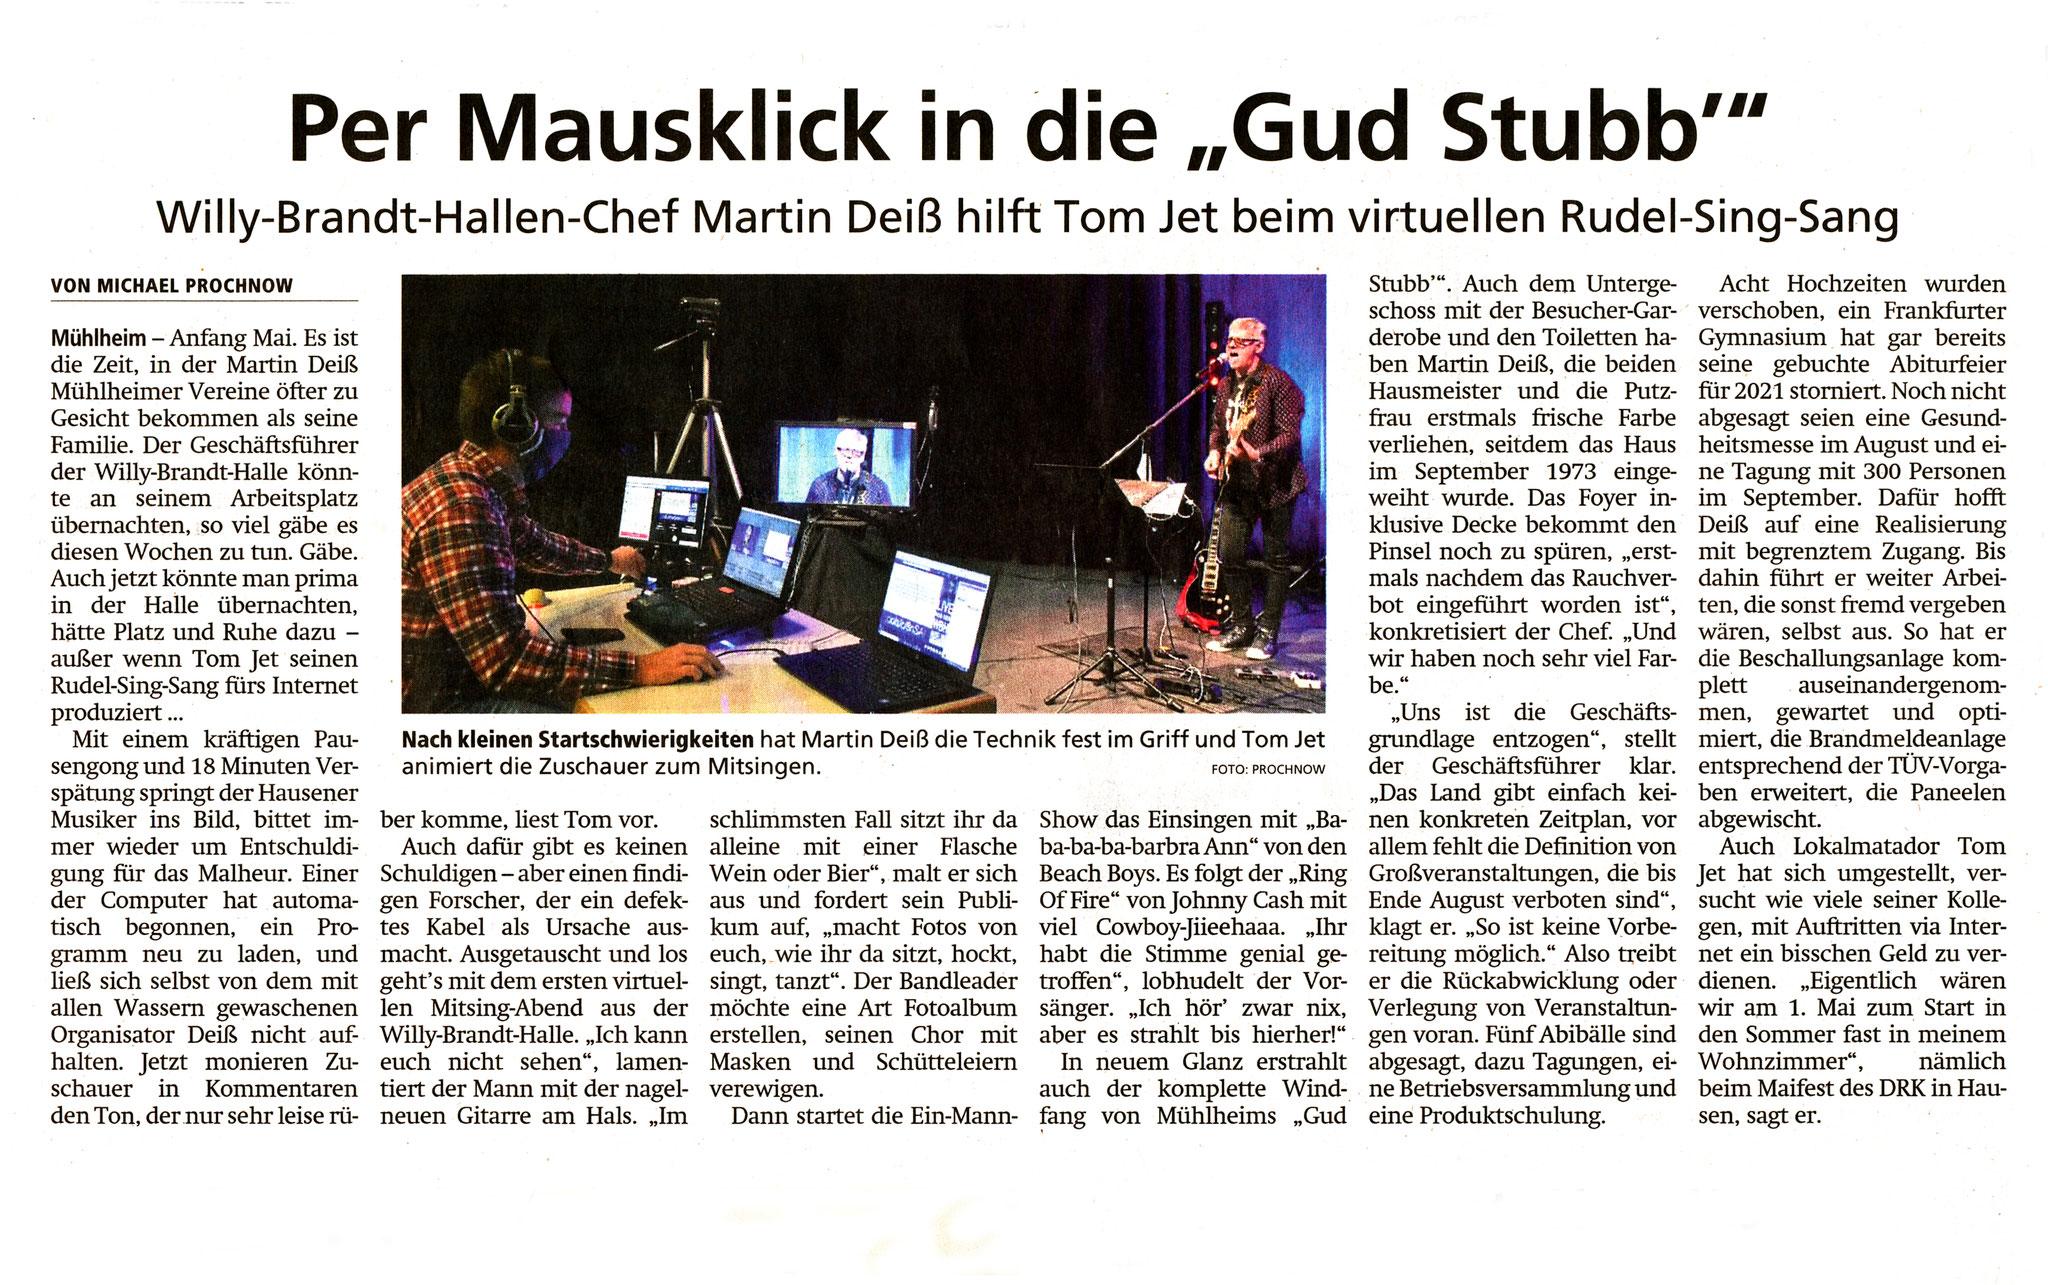 Offenbach Post, 4. Mai 2020